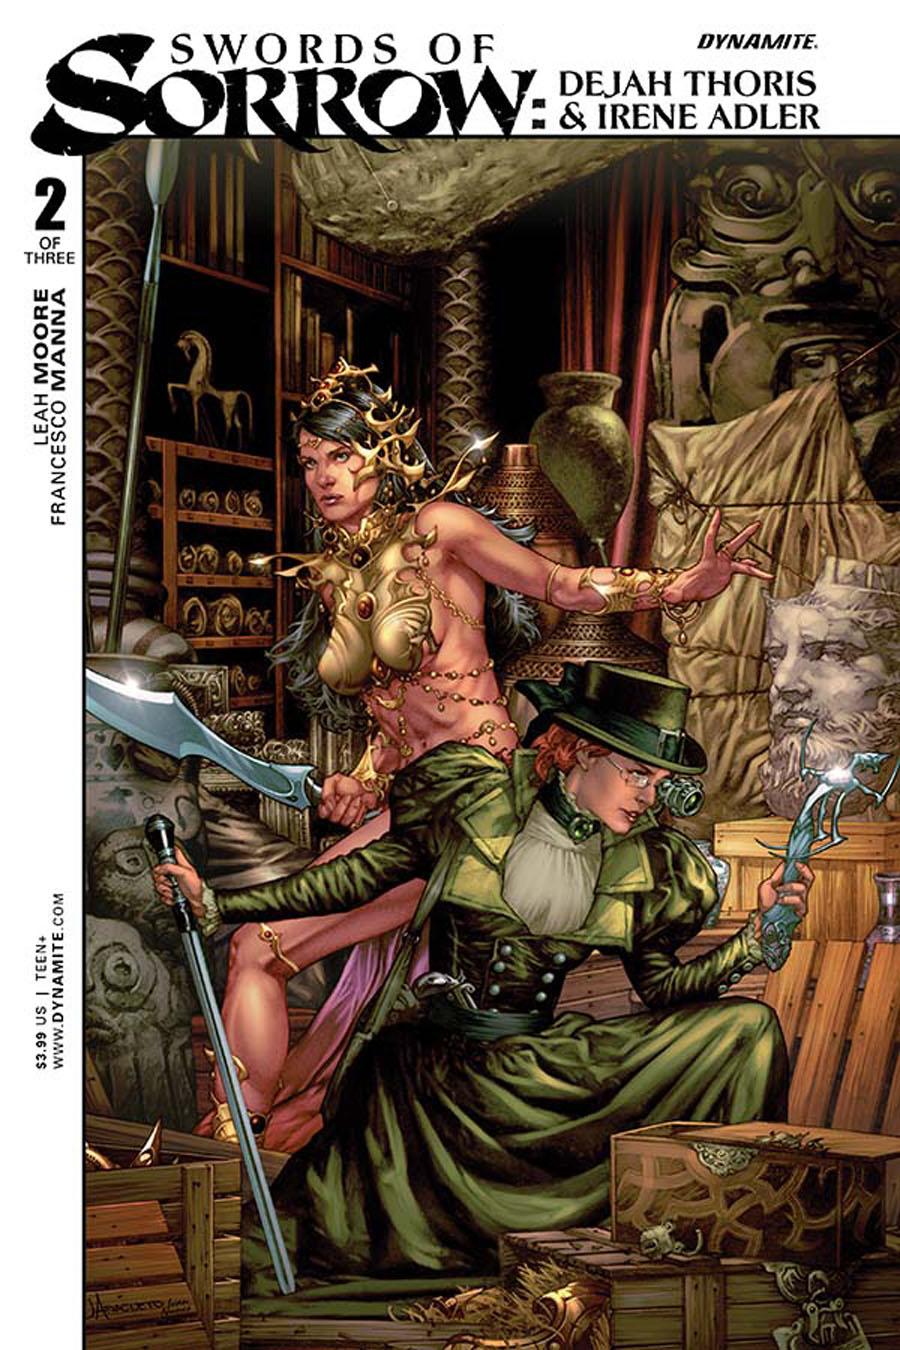 Swords Of Sorrow Dejah Thoris & Irene Adler #2 Cover A Regular Jay Anacleto Cover